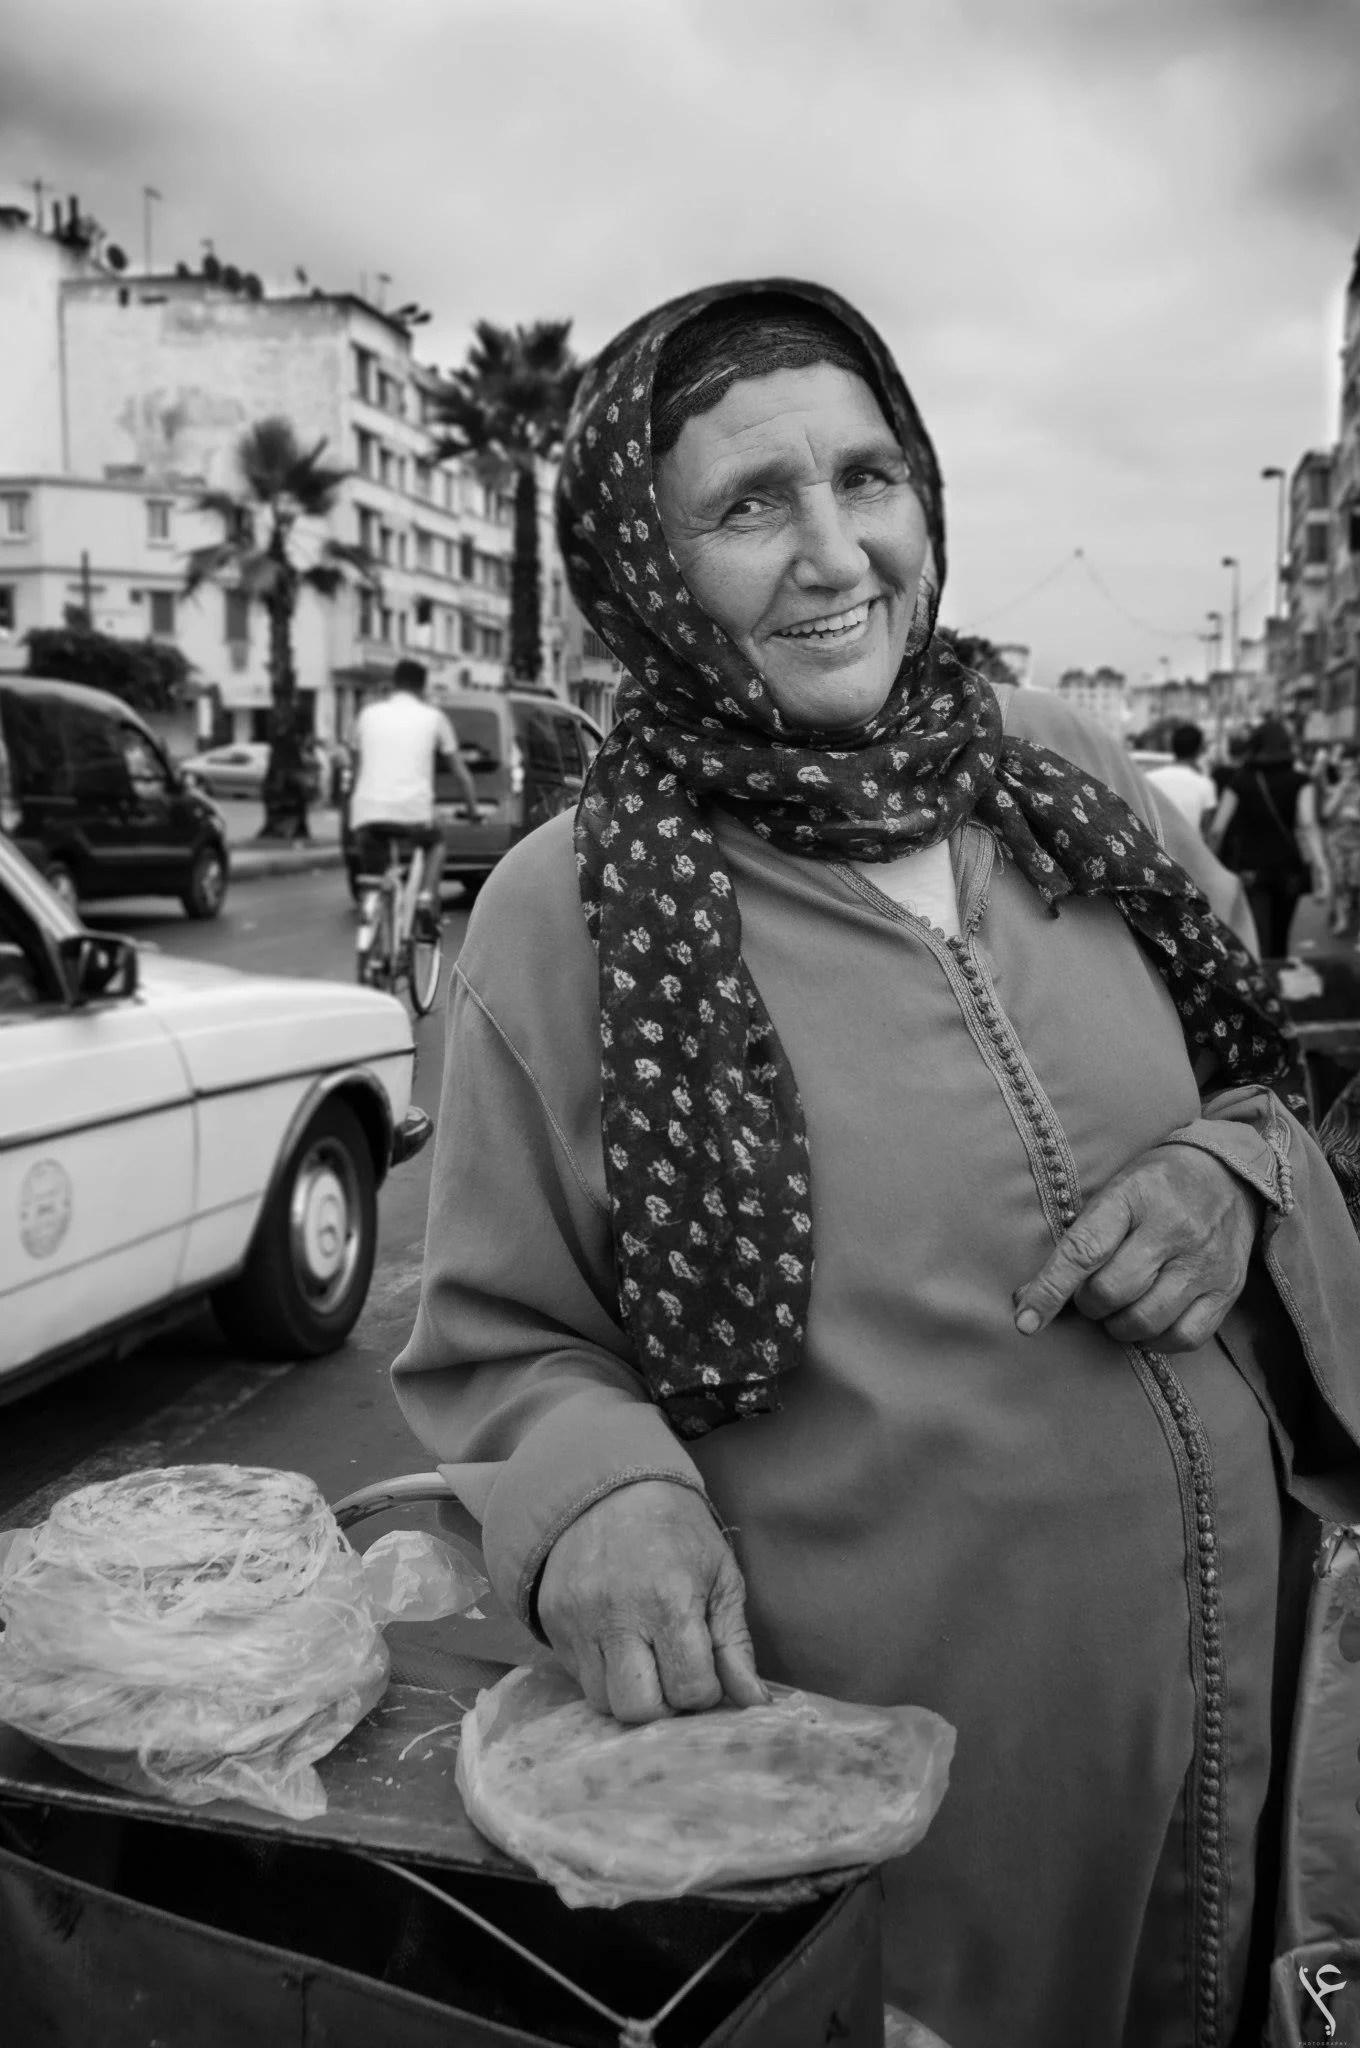 Mesamen vendor, Casablanca